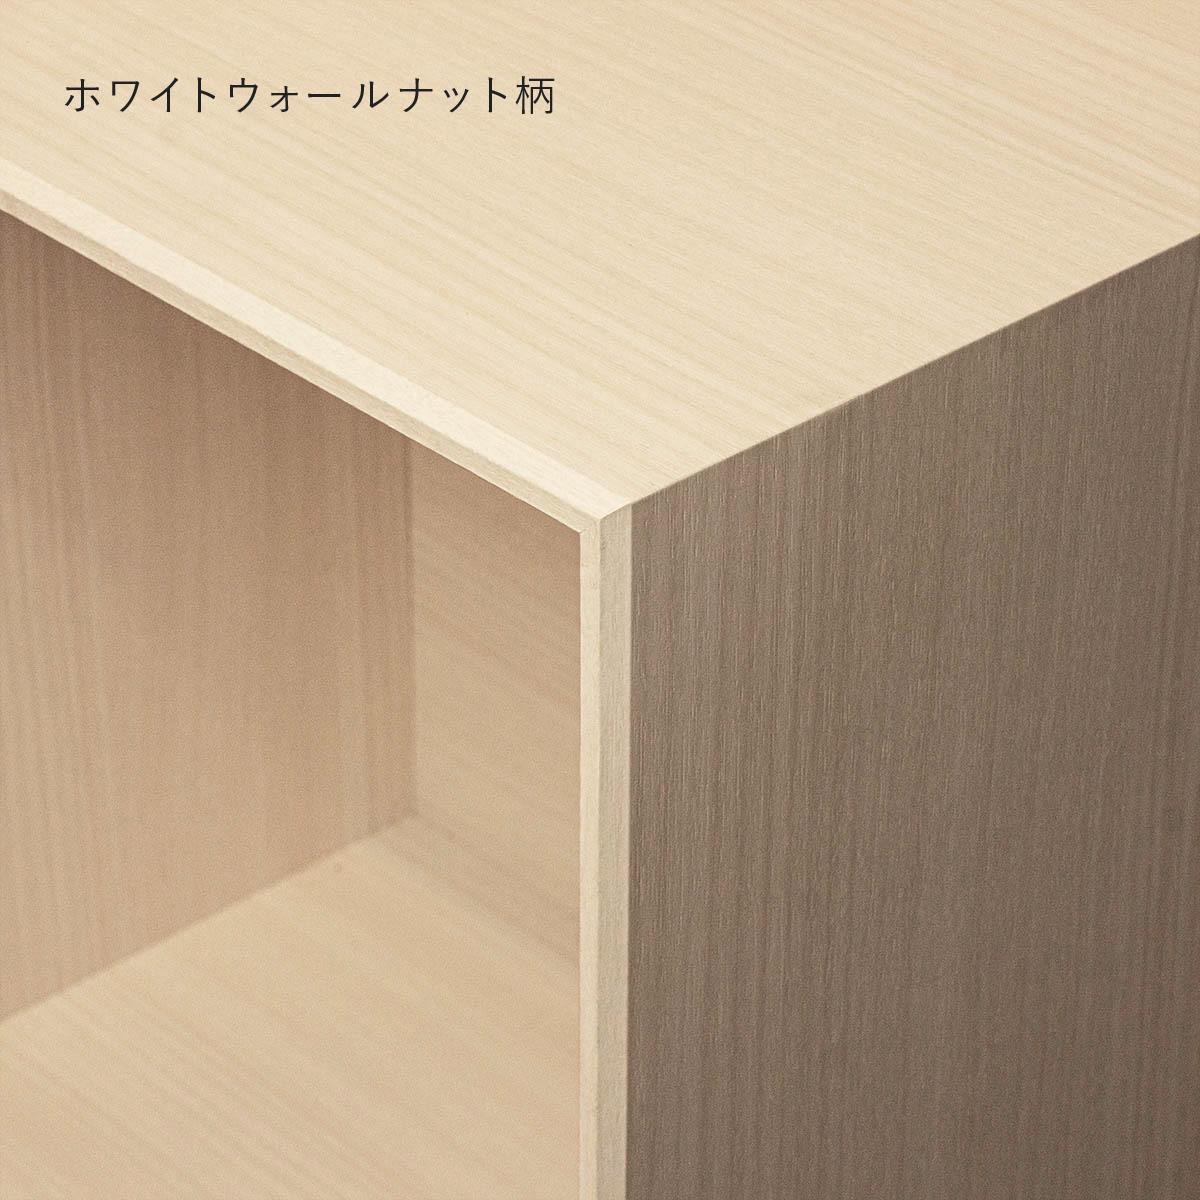 【 V-TISS LIGHT #006 】 置き方で可能性広がる3つのボックス